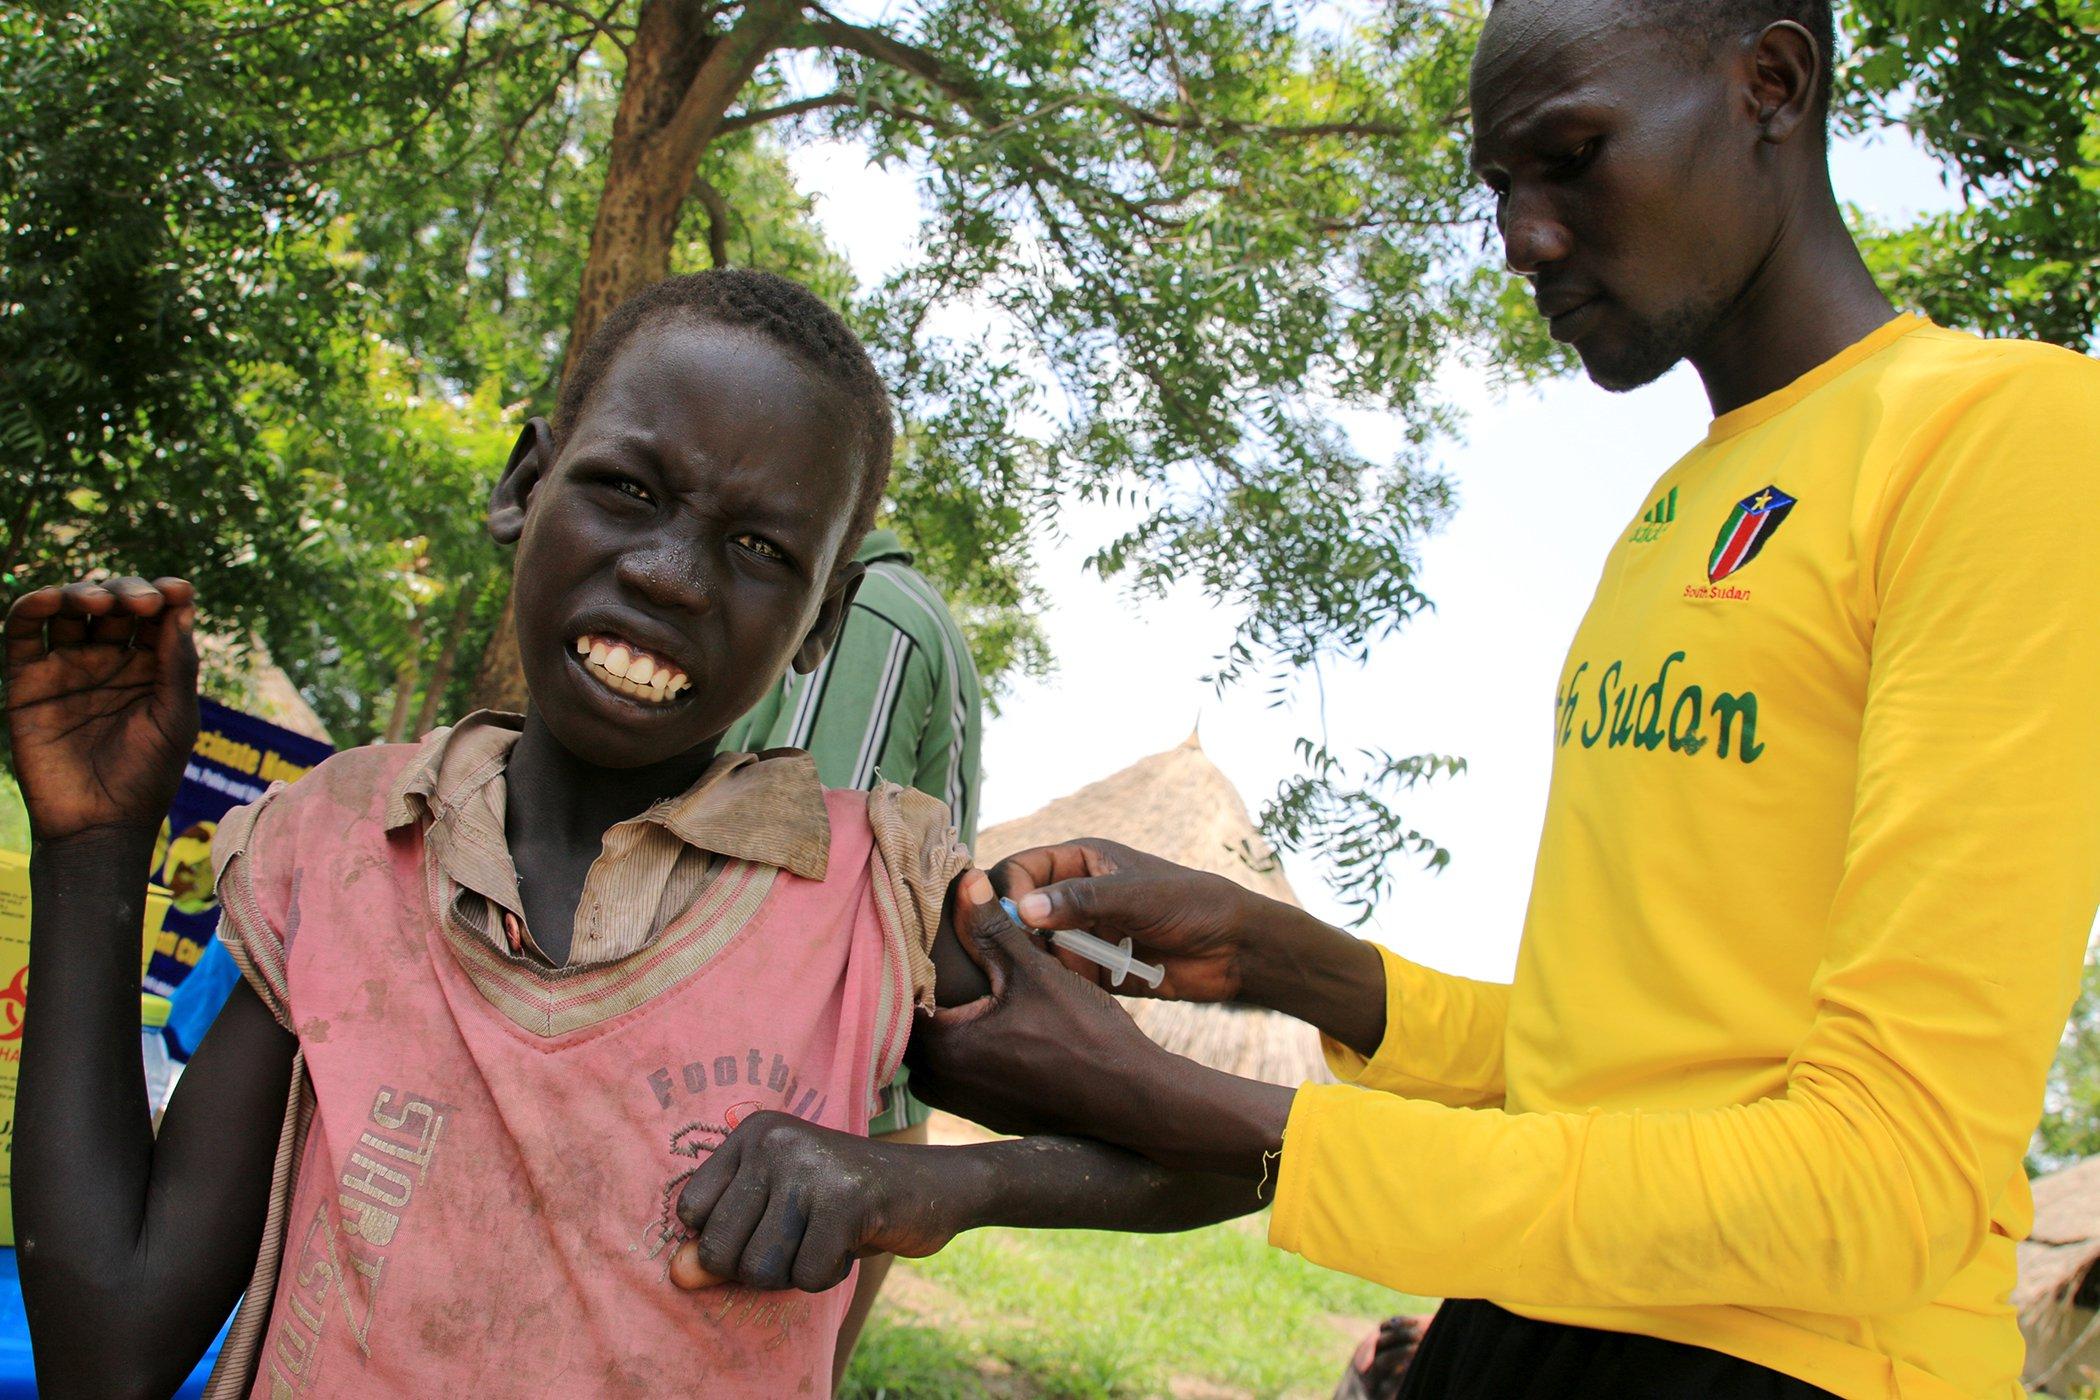 UNICEF_Vaccinations-Around-The-World_010.JPG